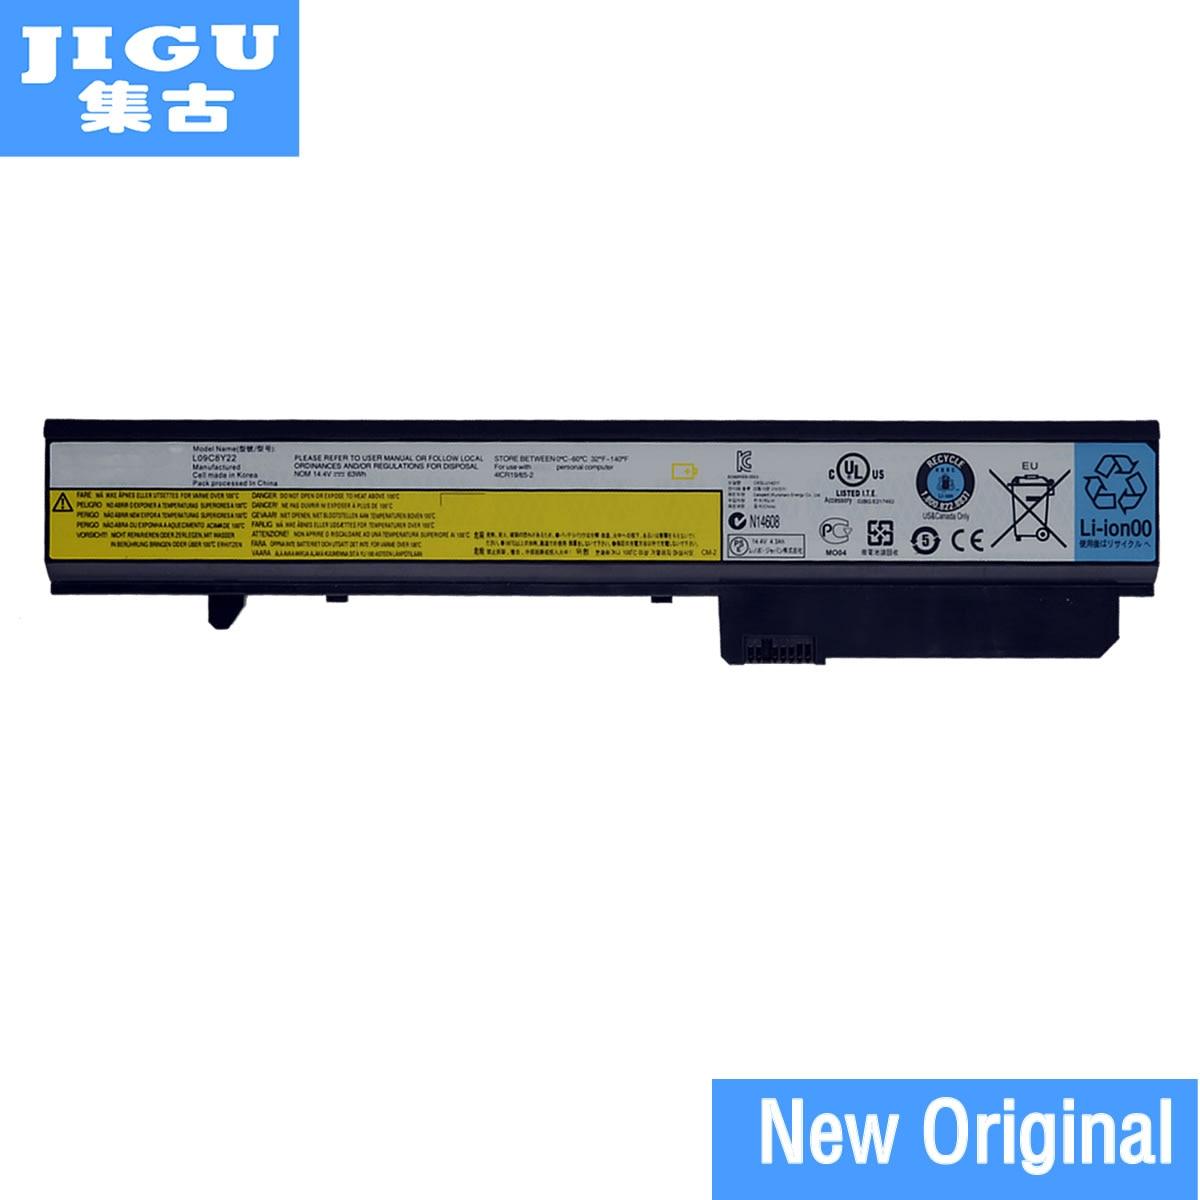 JIGU L09N8T22 L09N8Y22 L09P8Y22 LO9P8Y22 Original laptop Battery For Lenovo for IdeaPad U460 14.4V 64WH laptop batteries for lenovo ideapad u350 20028 l09n8p01 l09c4p1 14 8v 8 cell